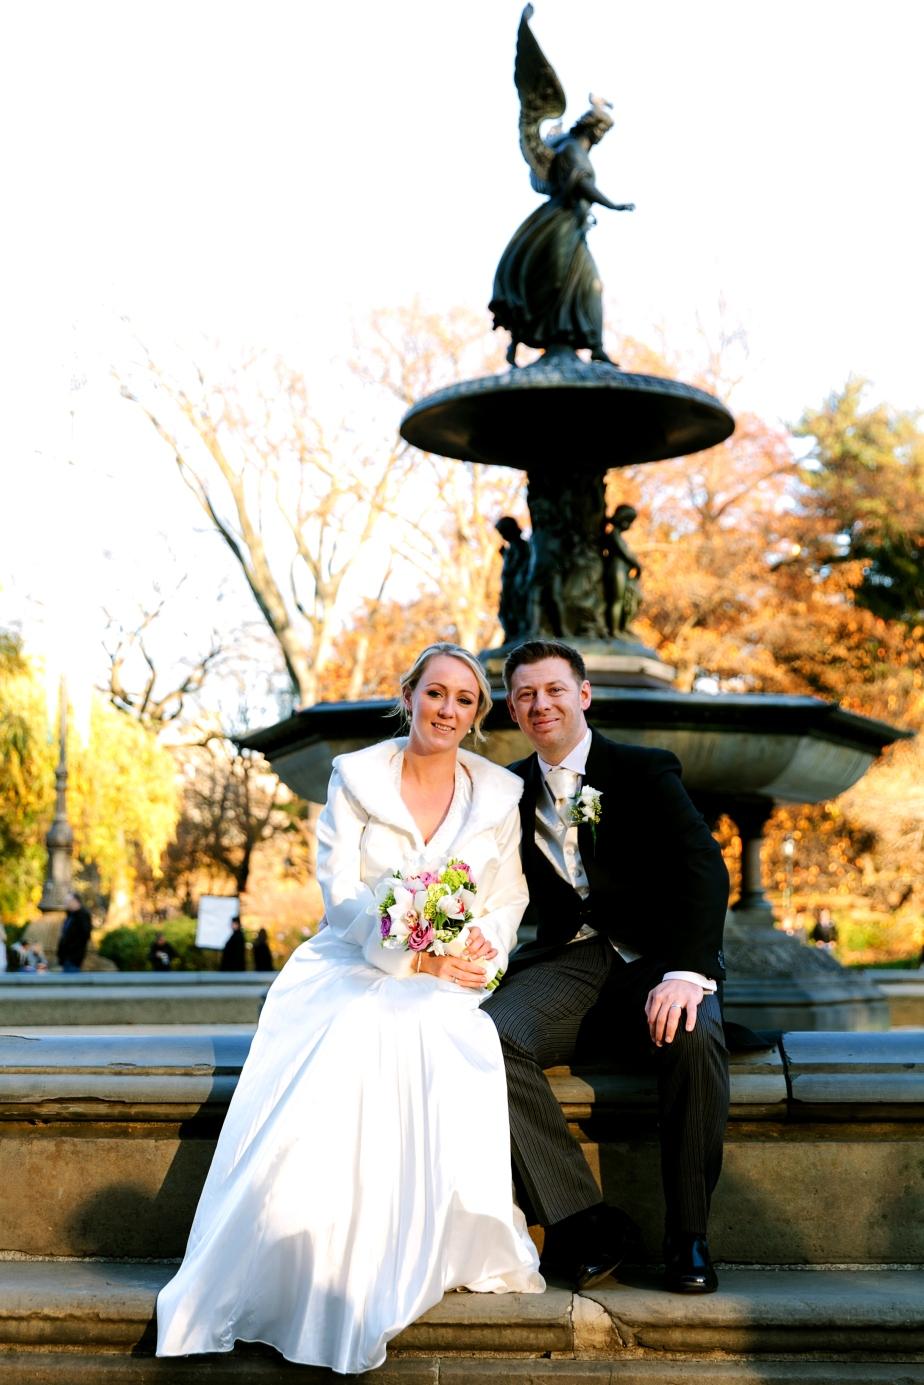 centralpark_ladiespavilion_wedding_EJ-230